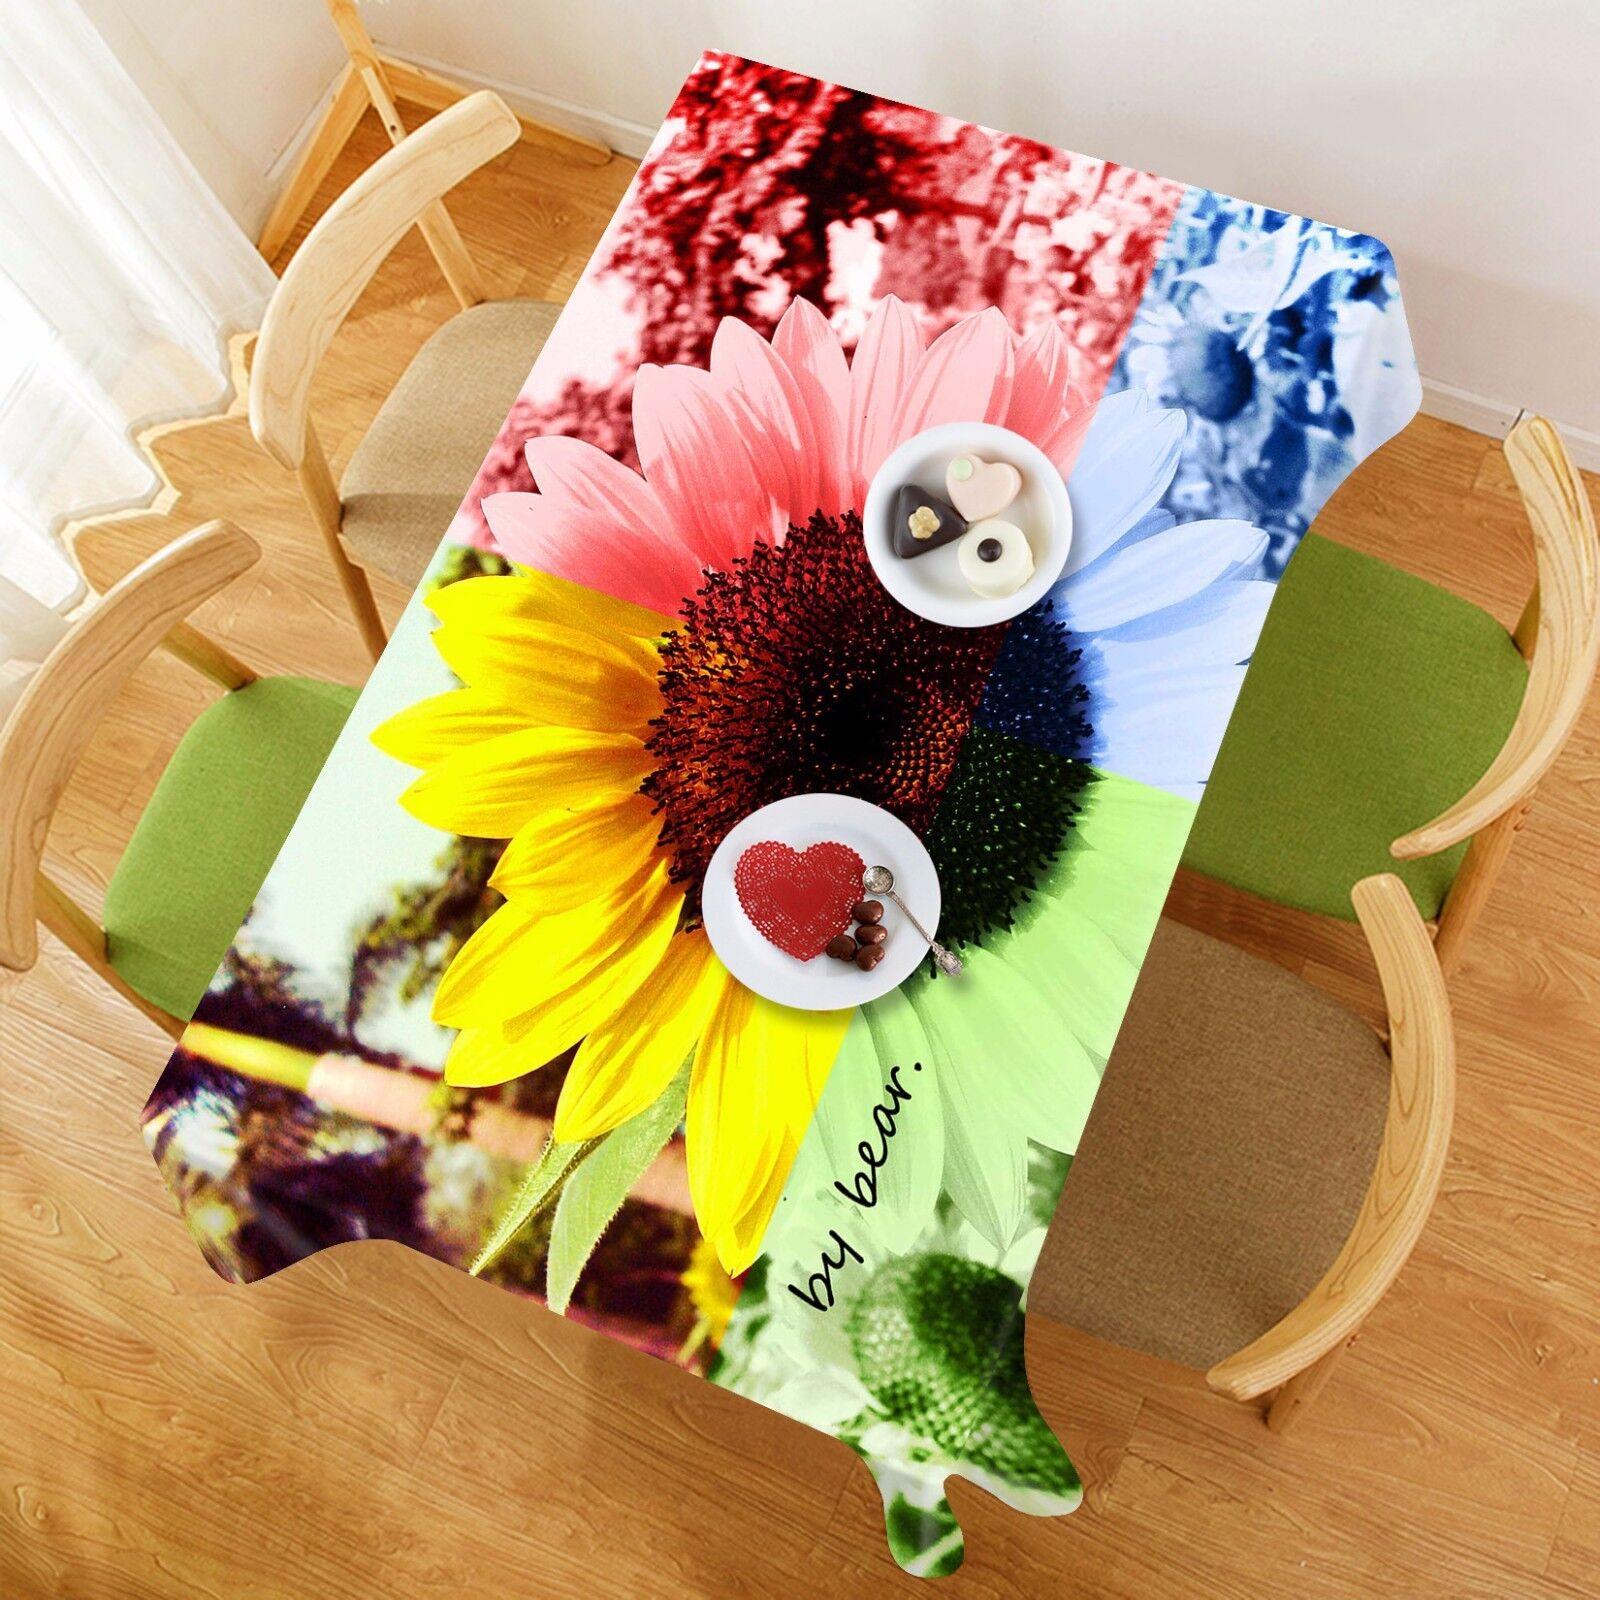 3D Colour 4228 Tablecloth Table Cover Cloth Birthday Party Event AJ WALLPAPER AU